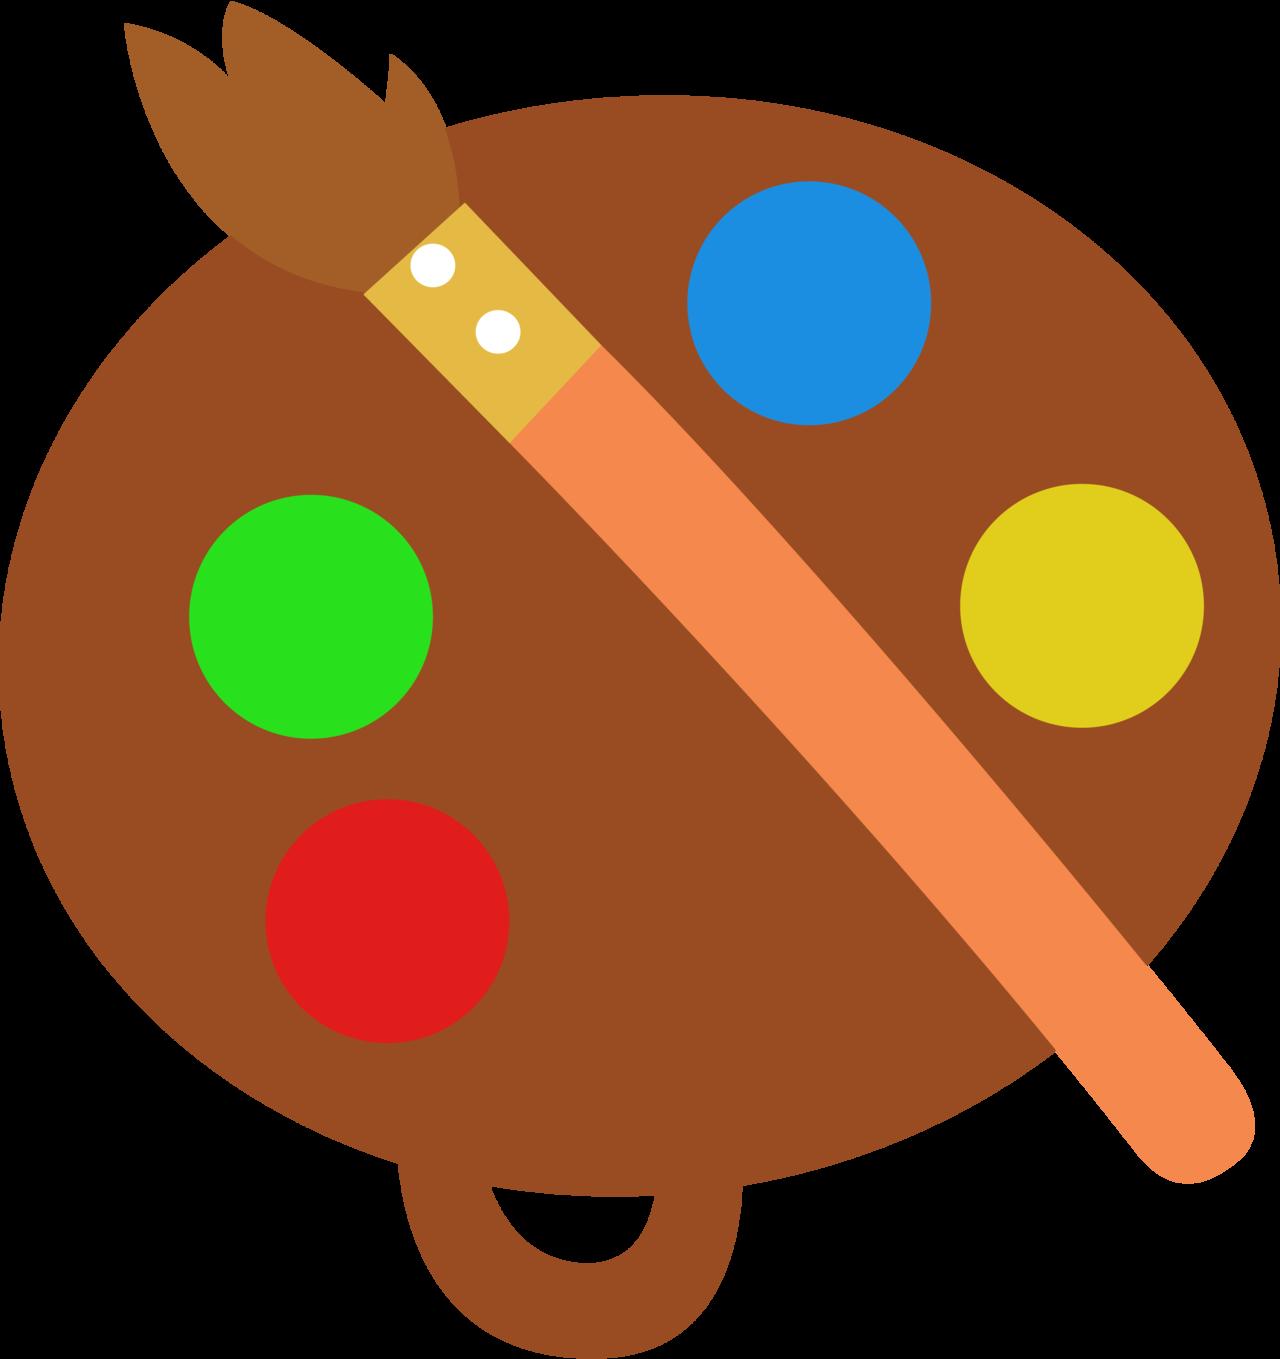 Request cutie mark rainbow. Paintbrush clipart stroke